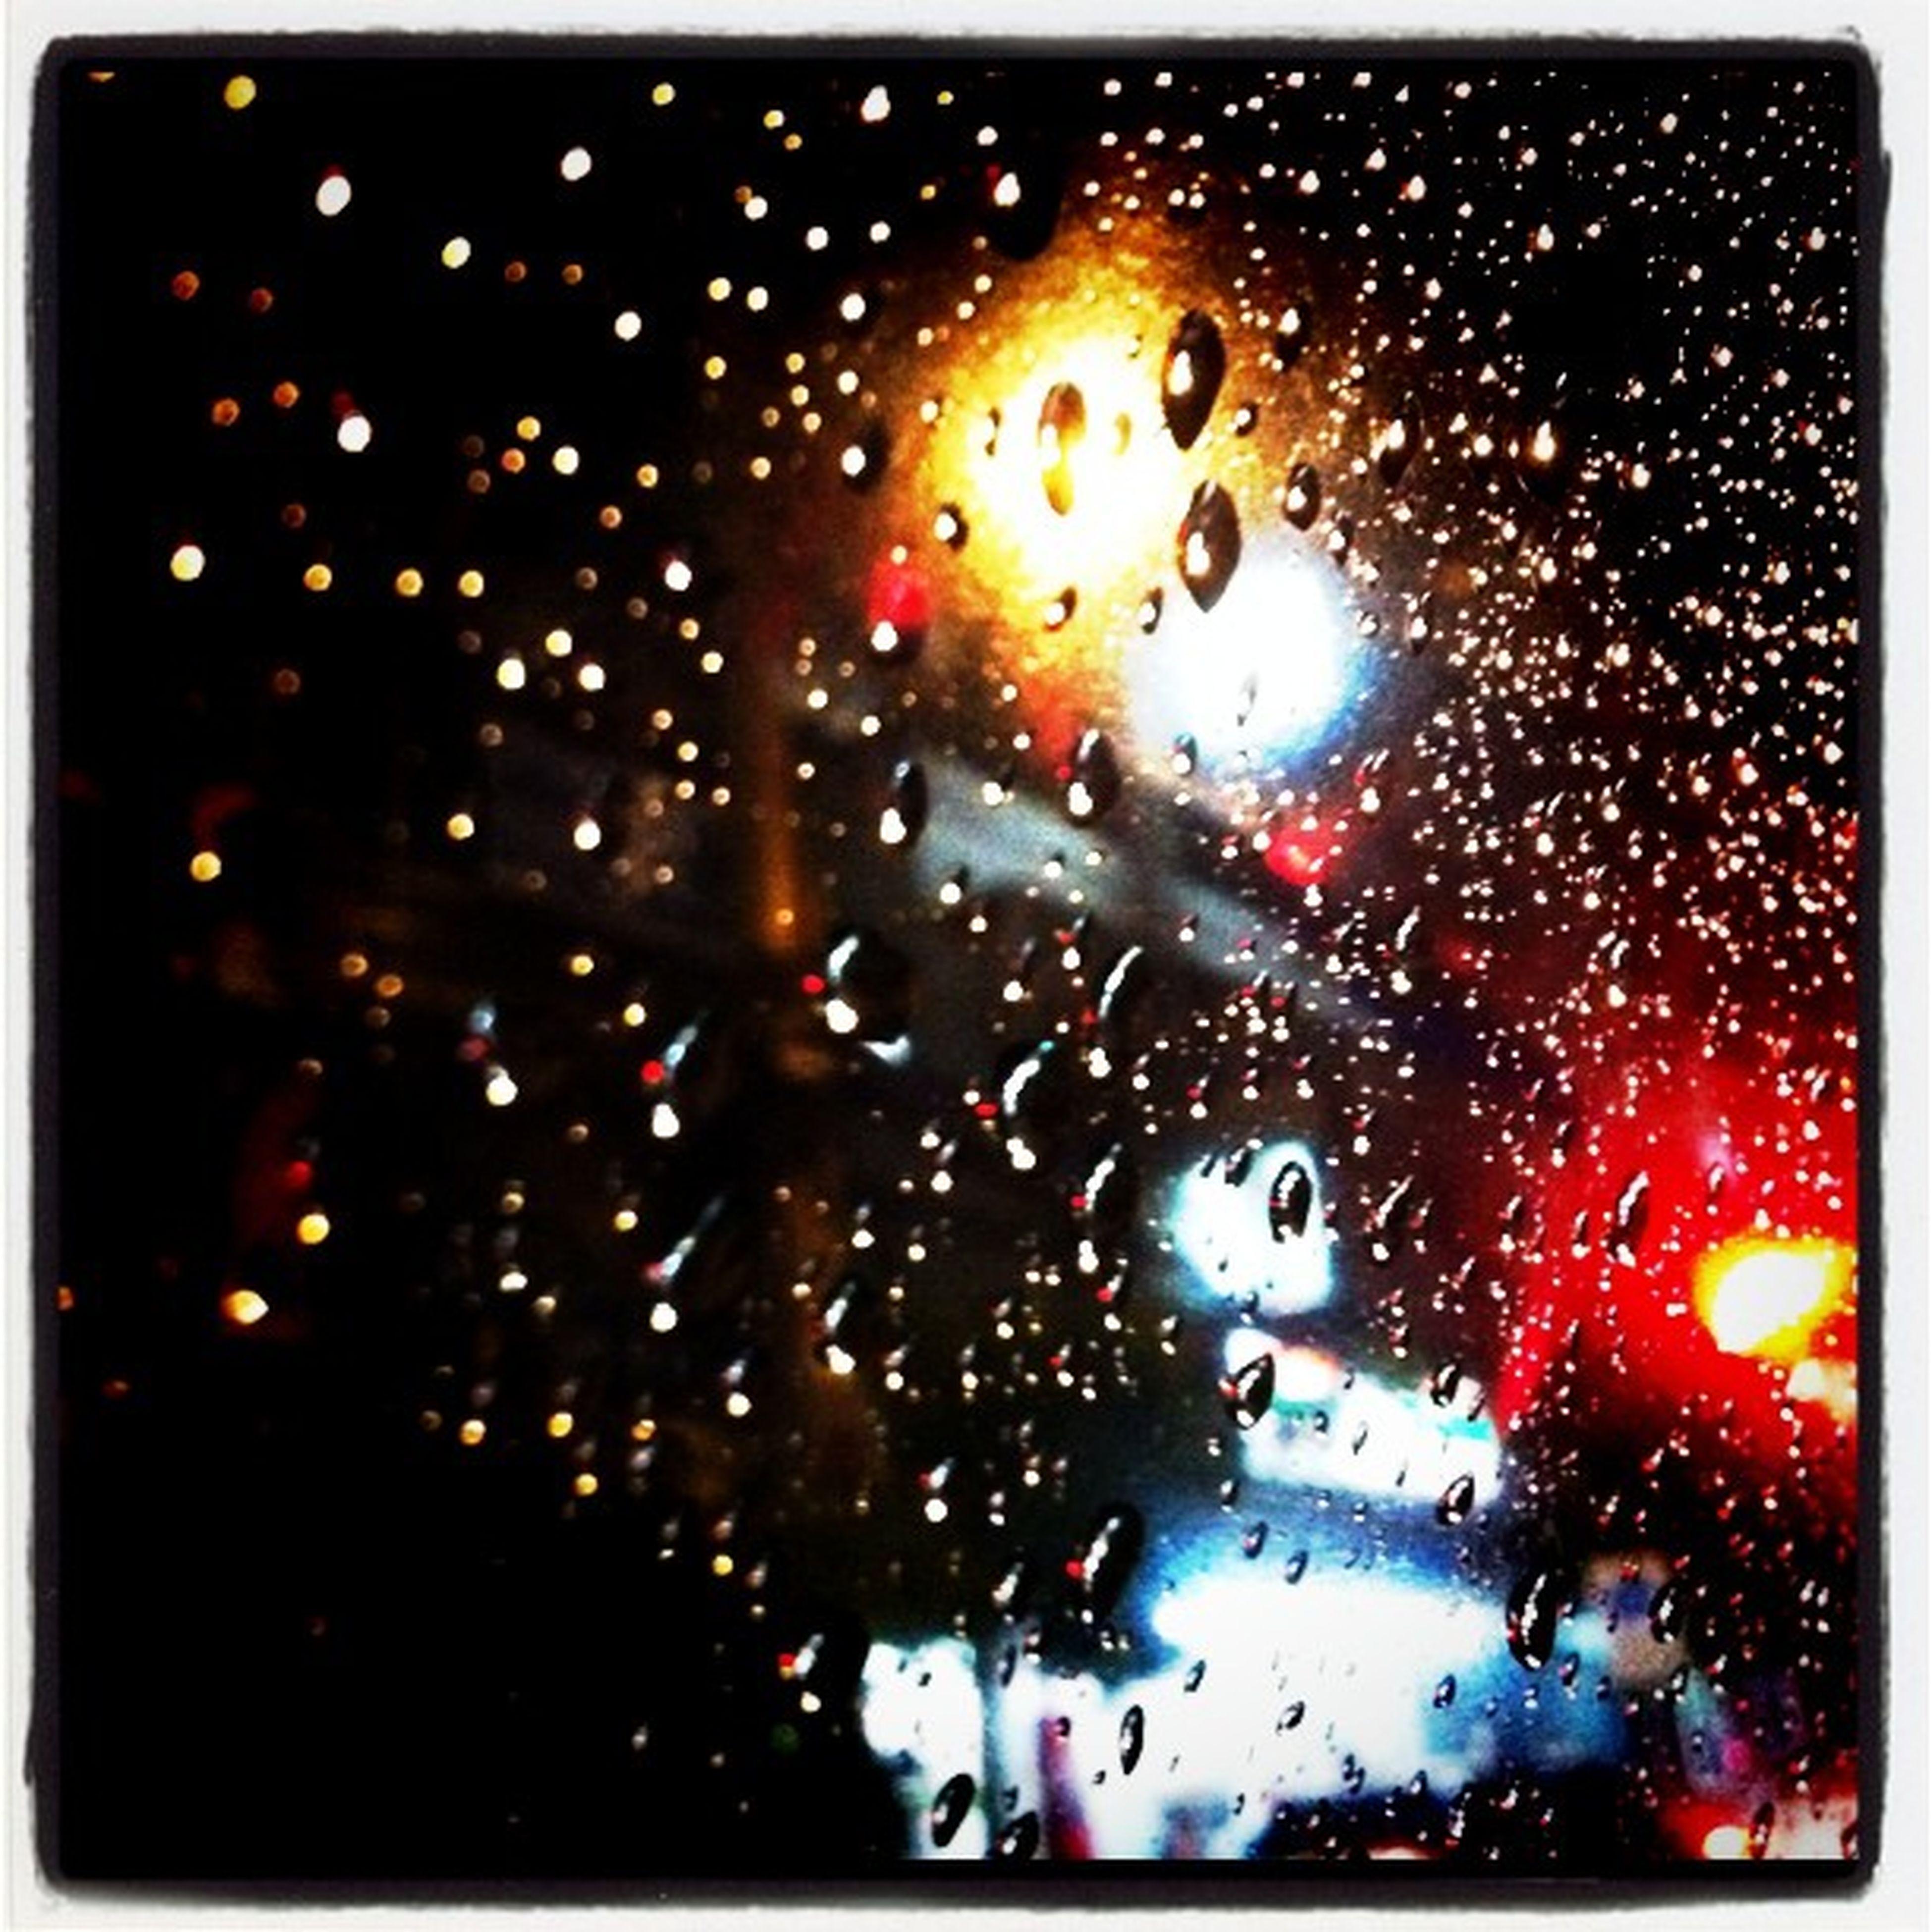 wet, window, drop, rain, transparent, indoors, glass - material, car, transportation, mode of transport, land vehicle, illuminated, raindrop, vehicle interior, season, water, weather, full frame, windshield, glass